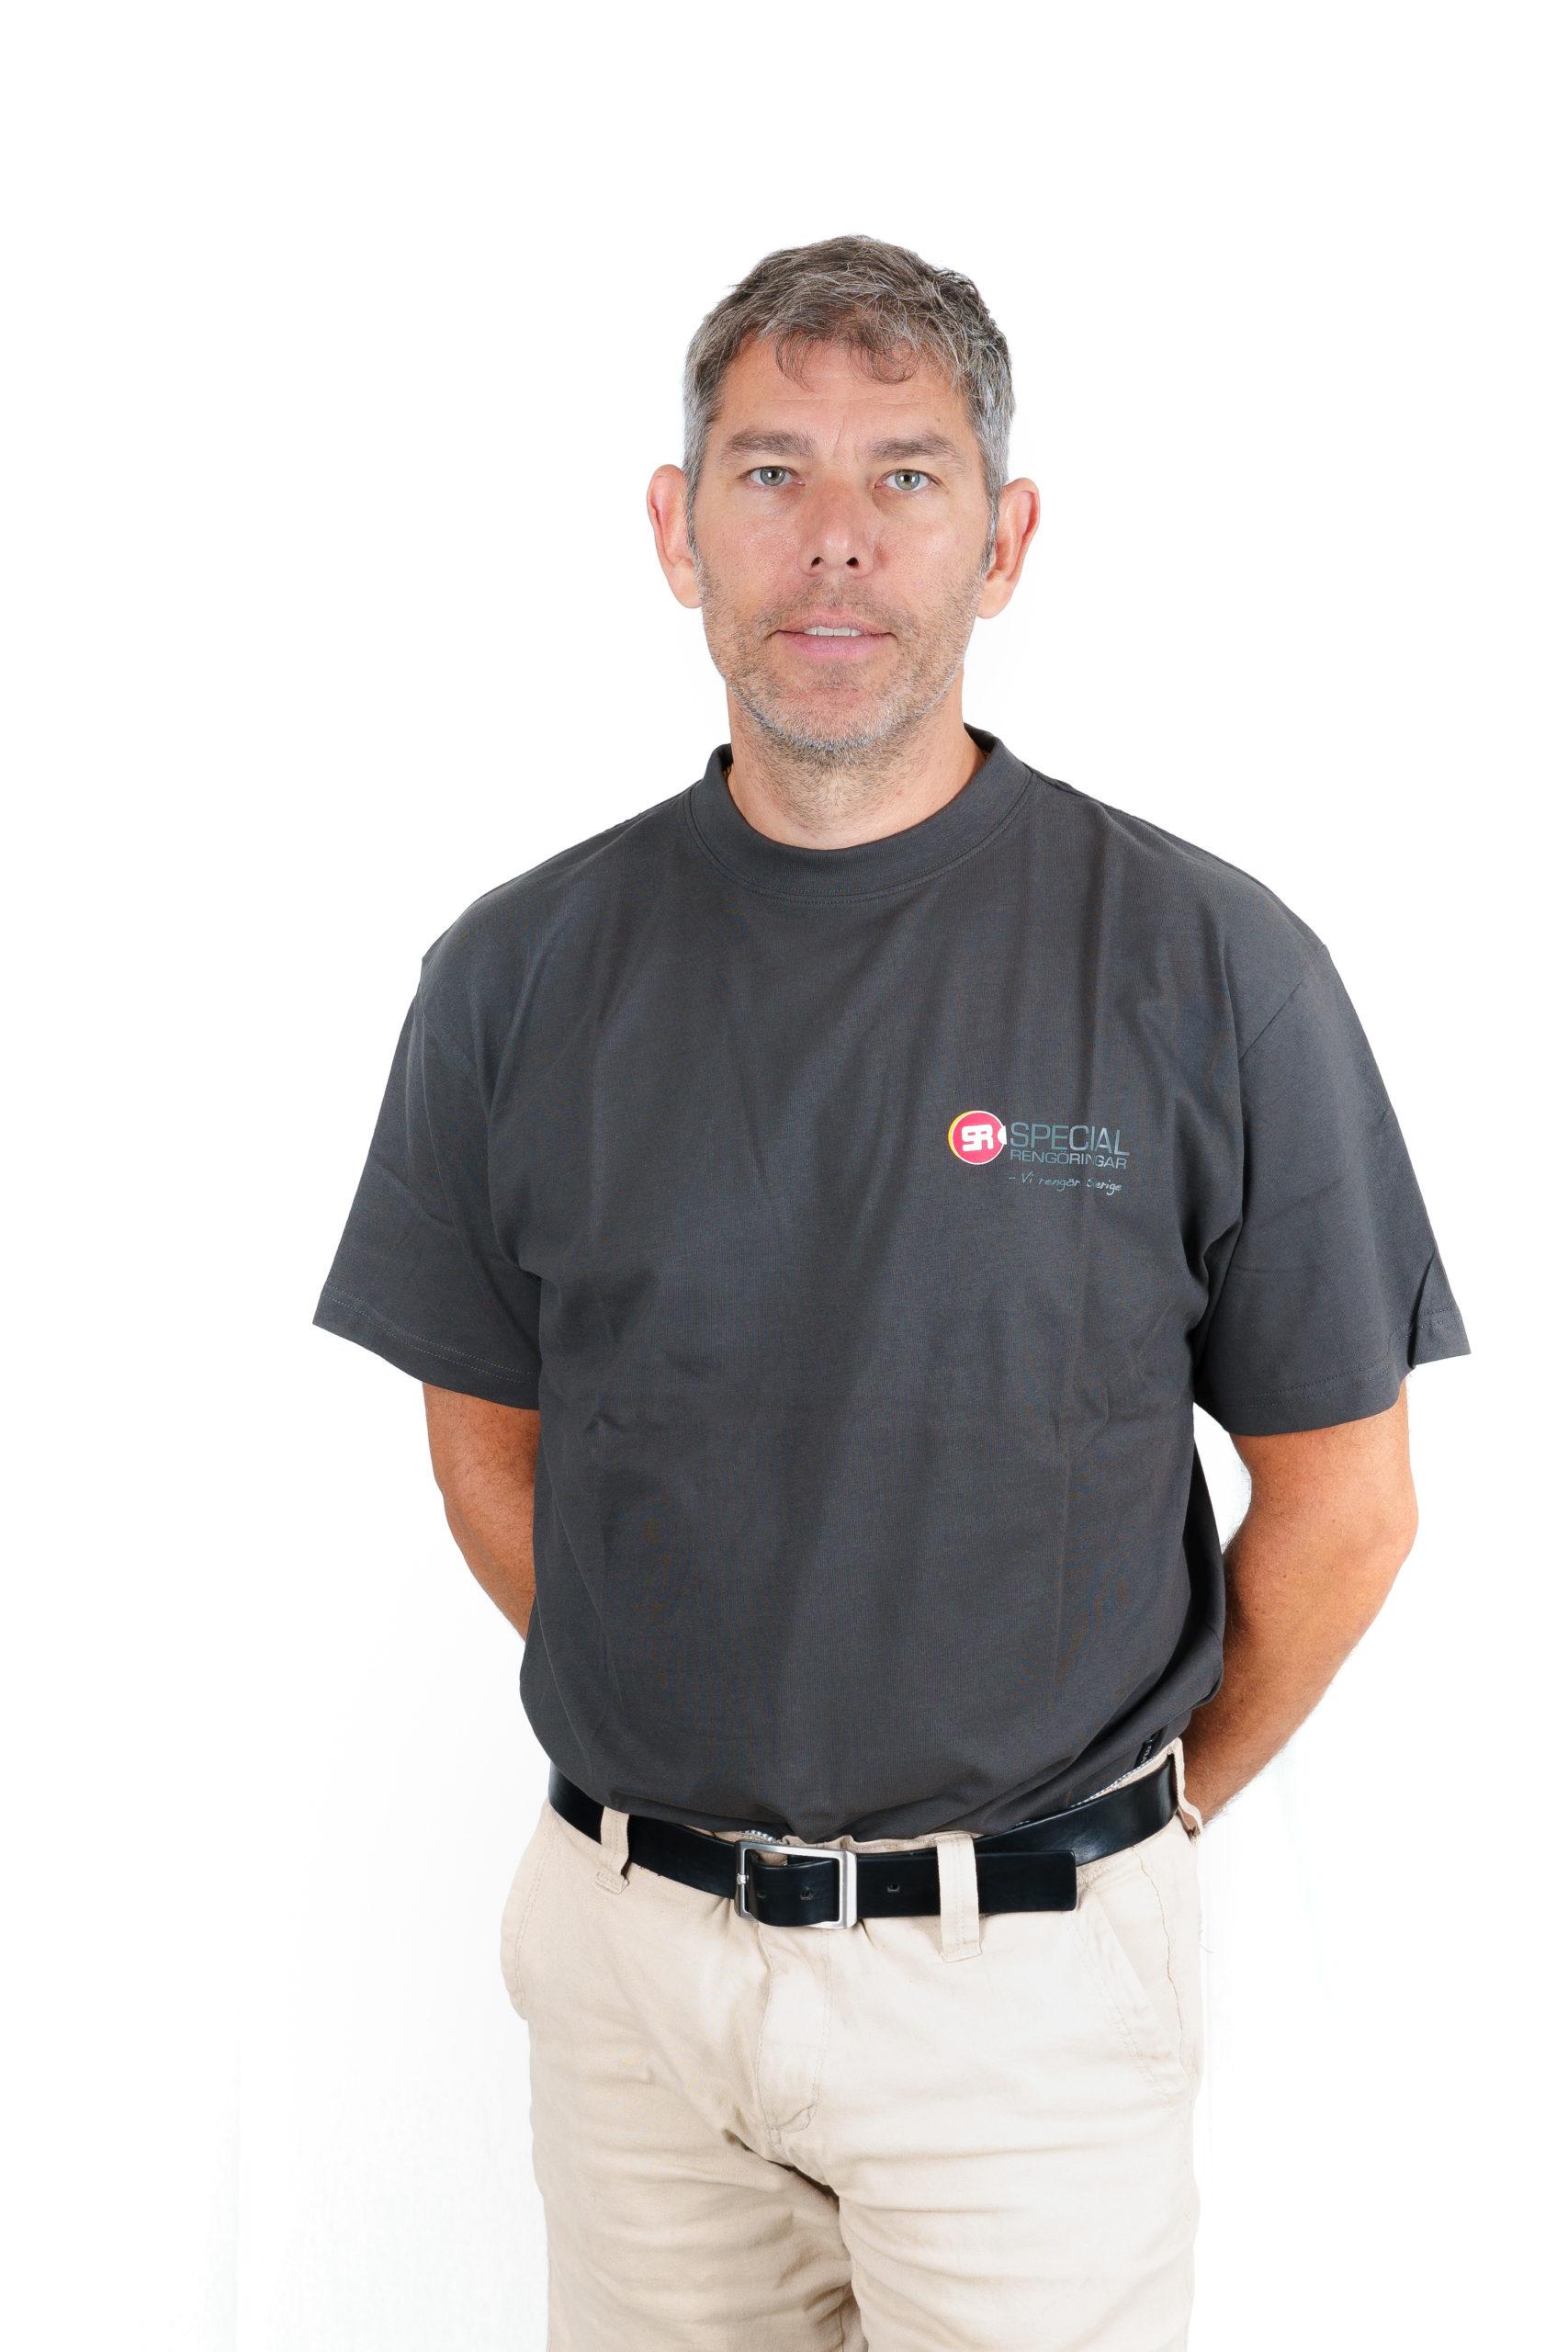 Jonas Jakobsson Specialrengöringar